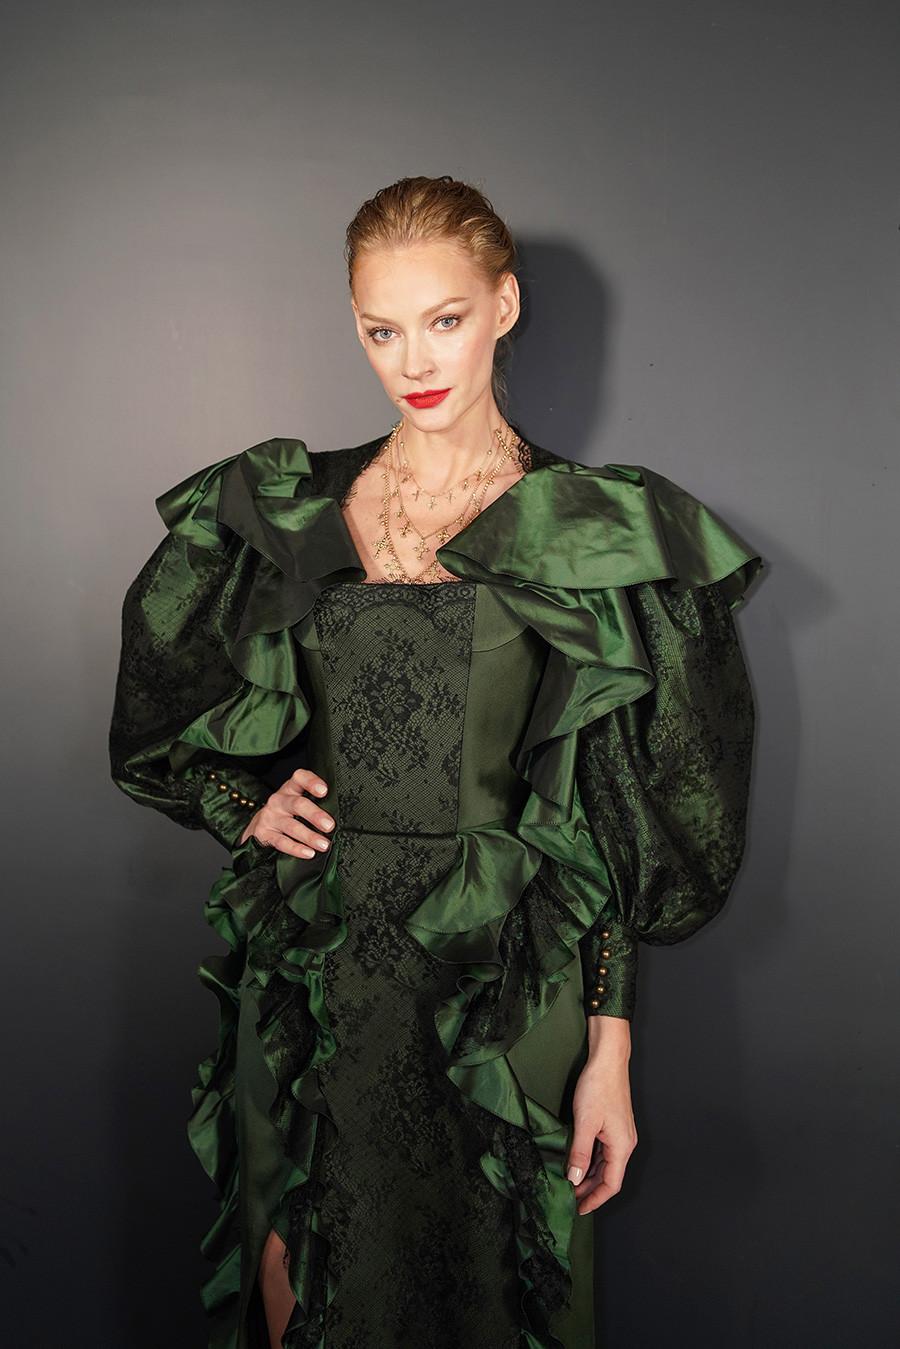 Svetlana Khodchenkova attends the Ulyana Sergeenko Spring Summer 2019 show as part of Paris Fashion Week at Theatre Marigny on January 21, 2019 in Paris, France